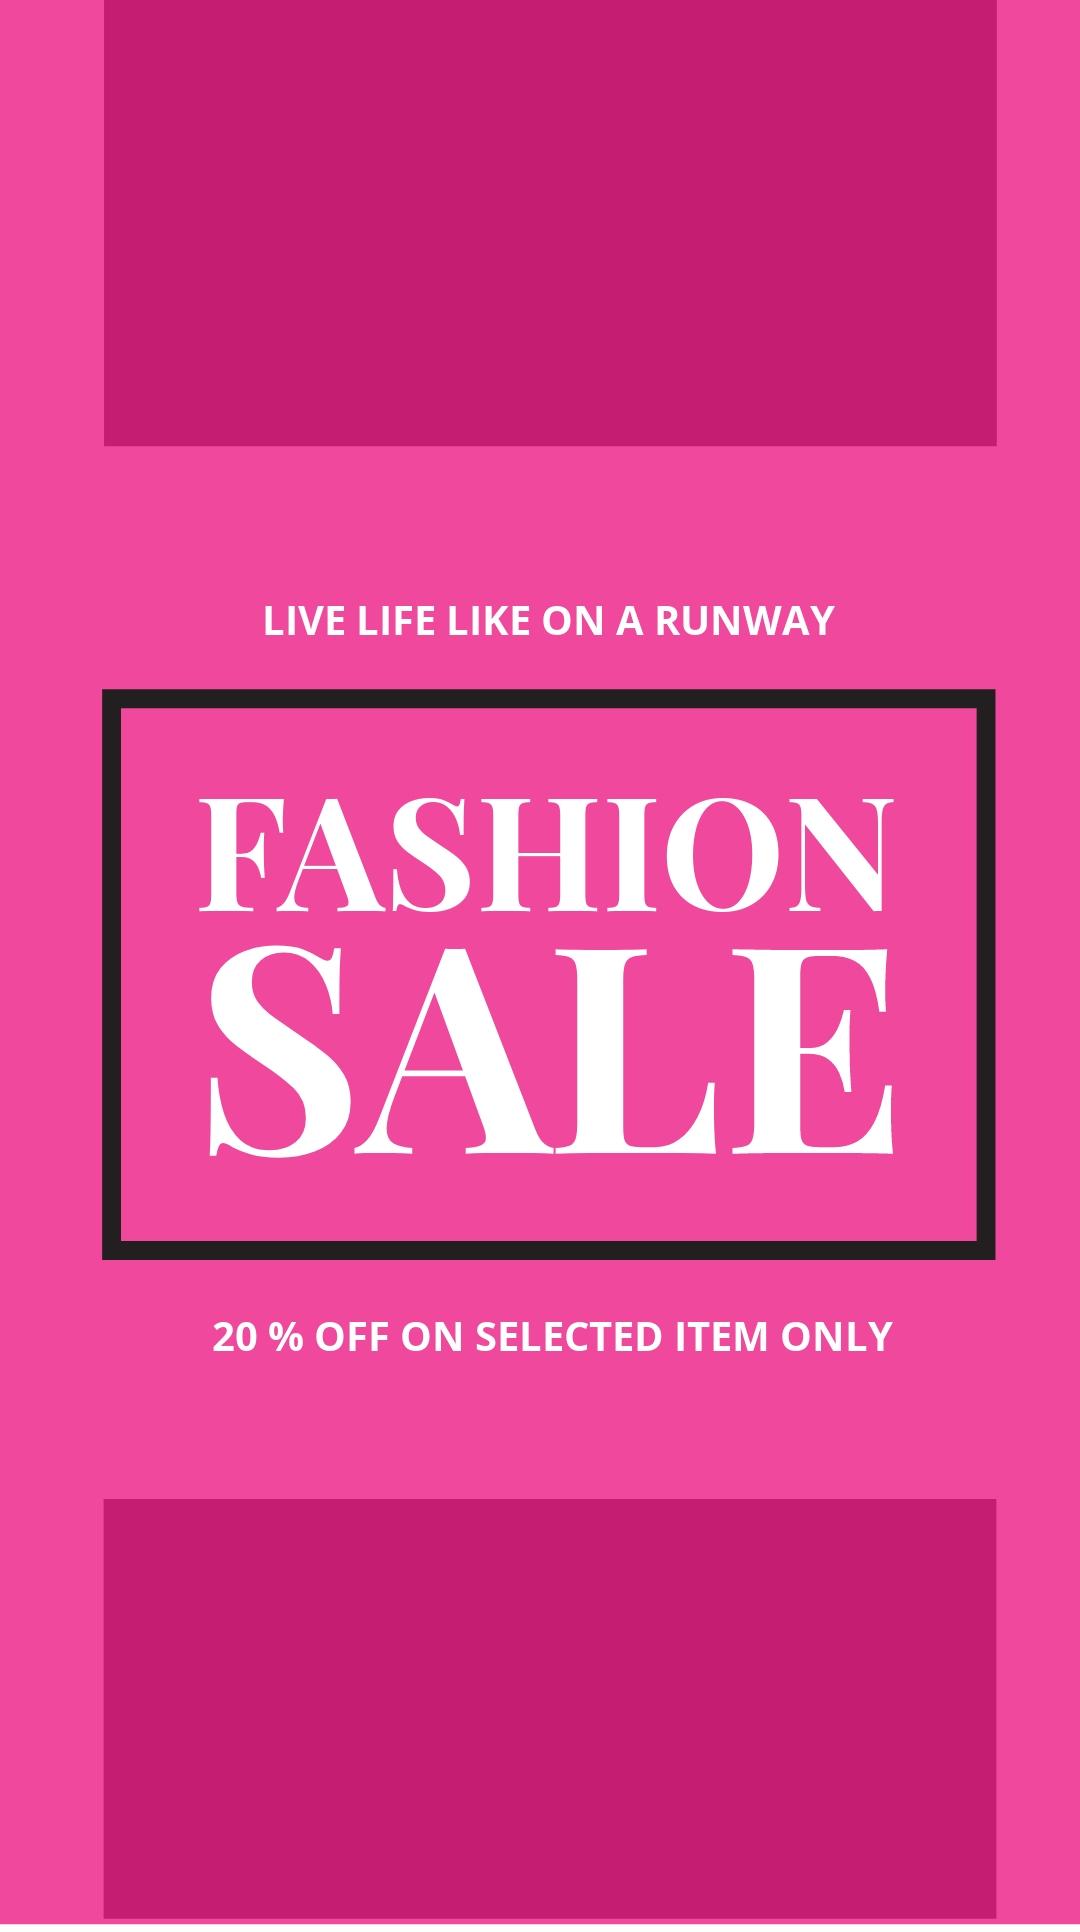 Free Blank Fashion Sale Instagram Story Template